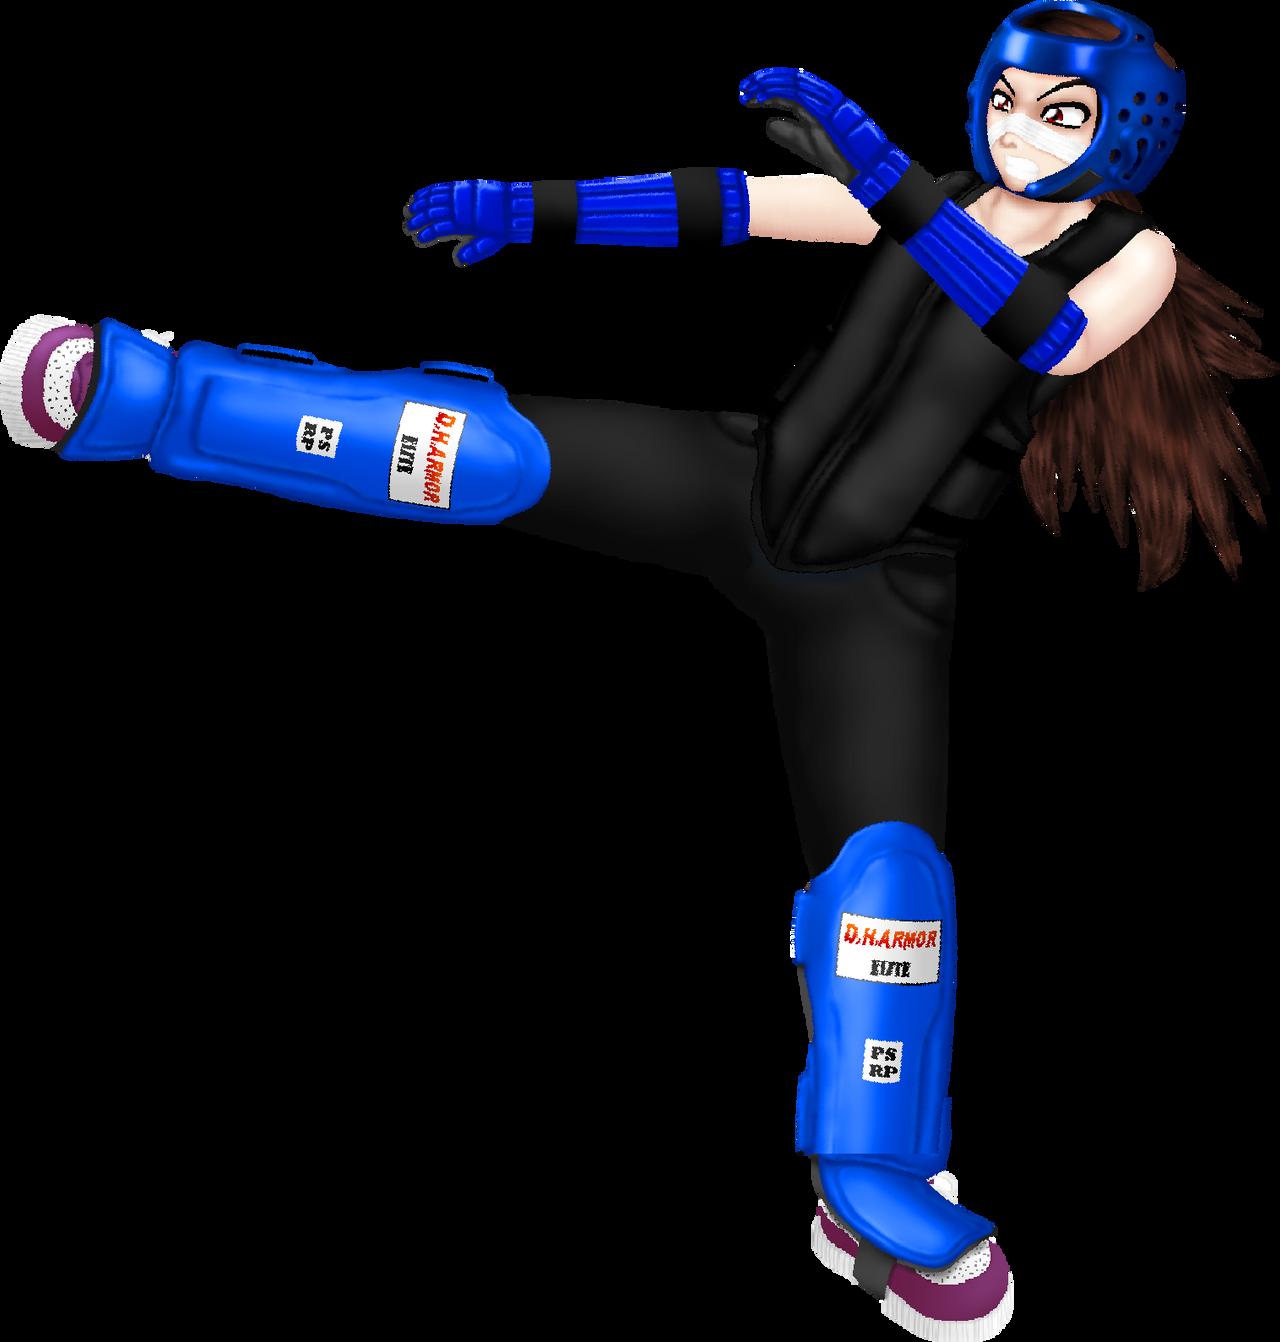 Cyril Kickboxing Gear